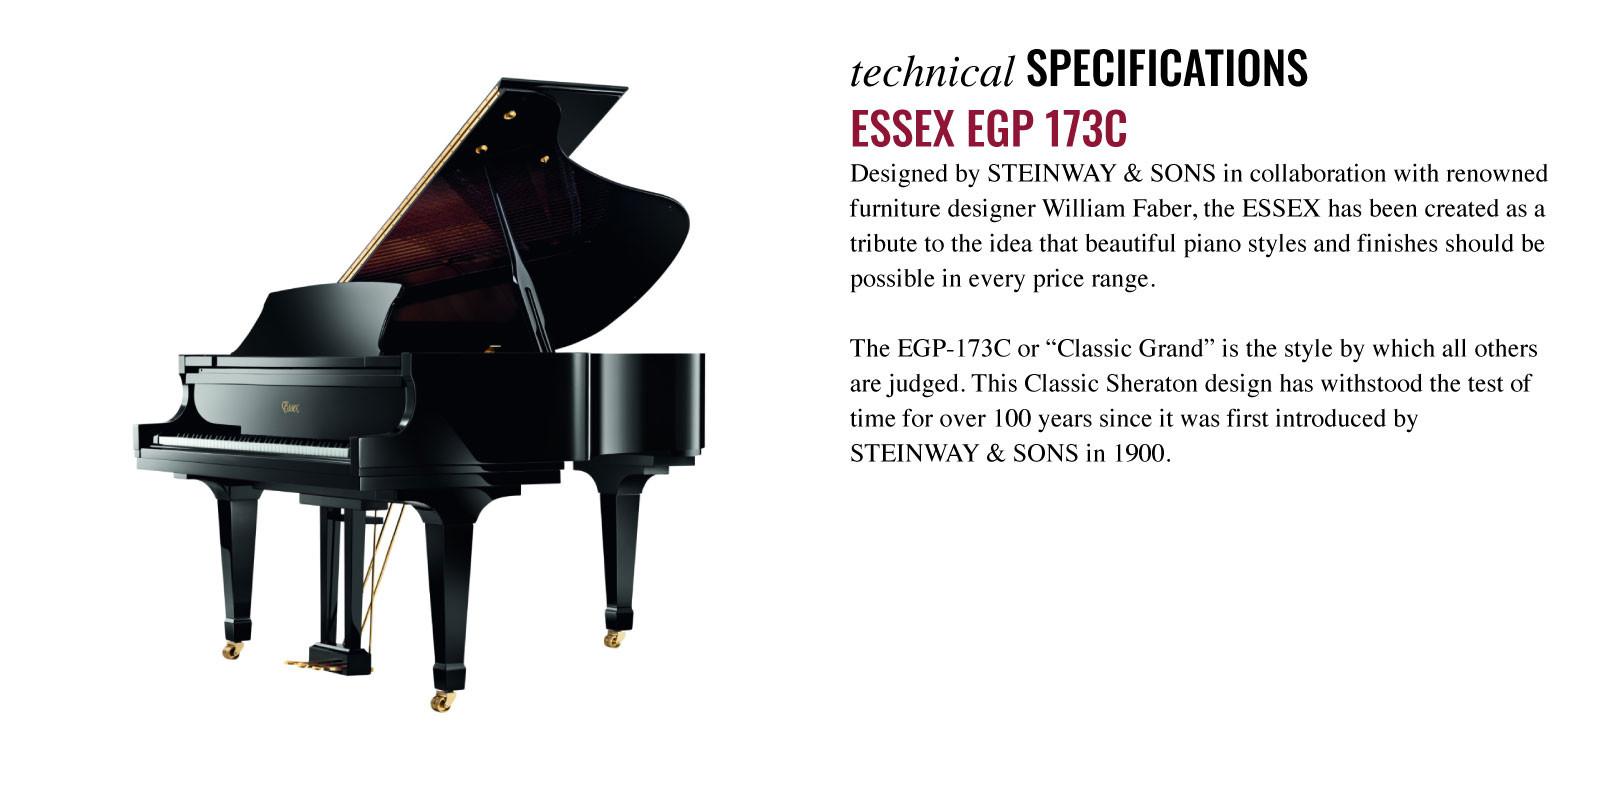 PP-Essex-EGP-173C-Details-1.jpg